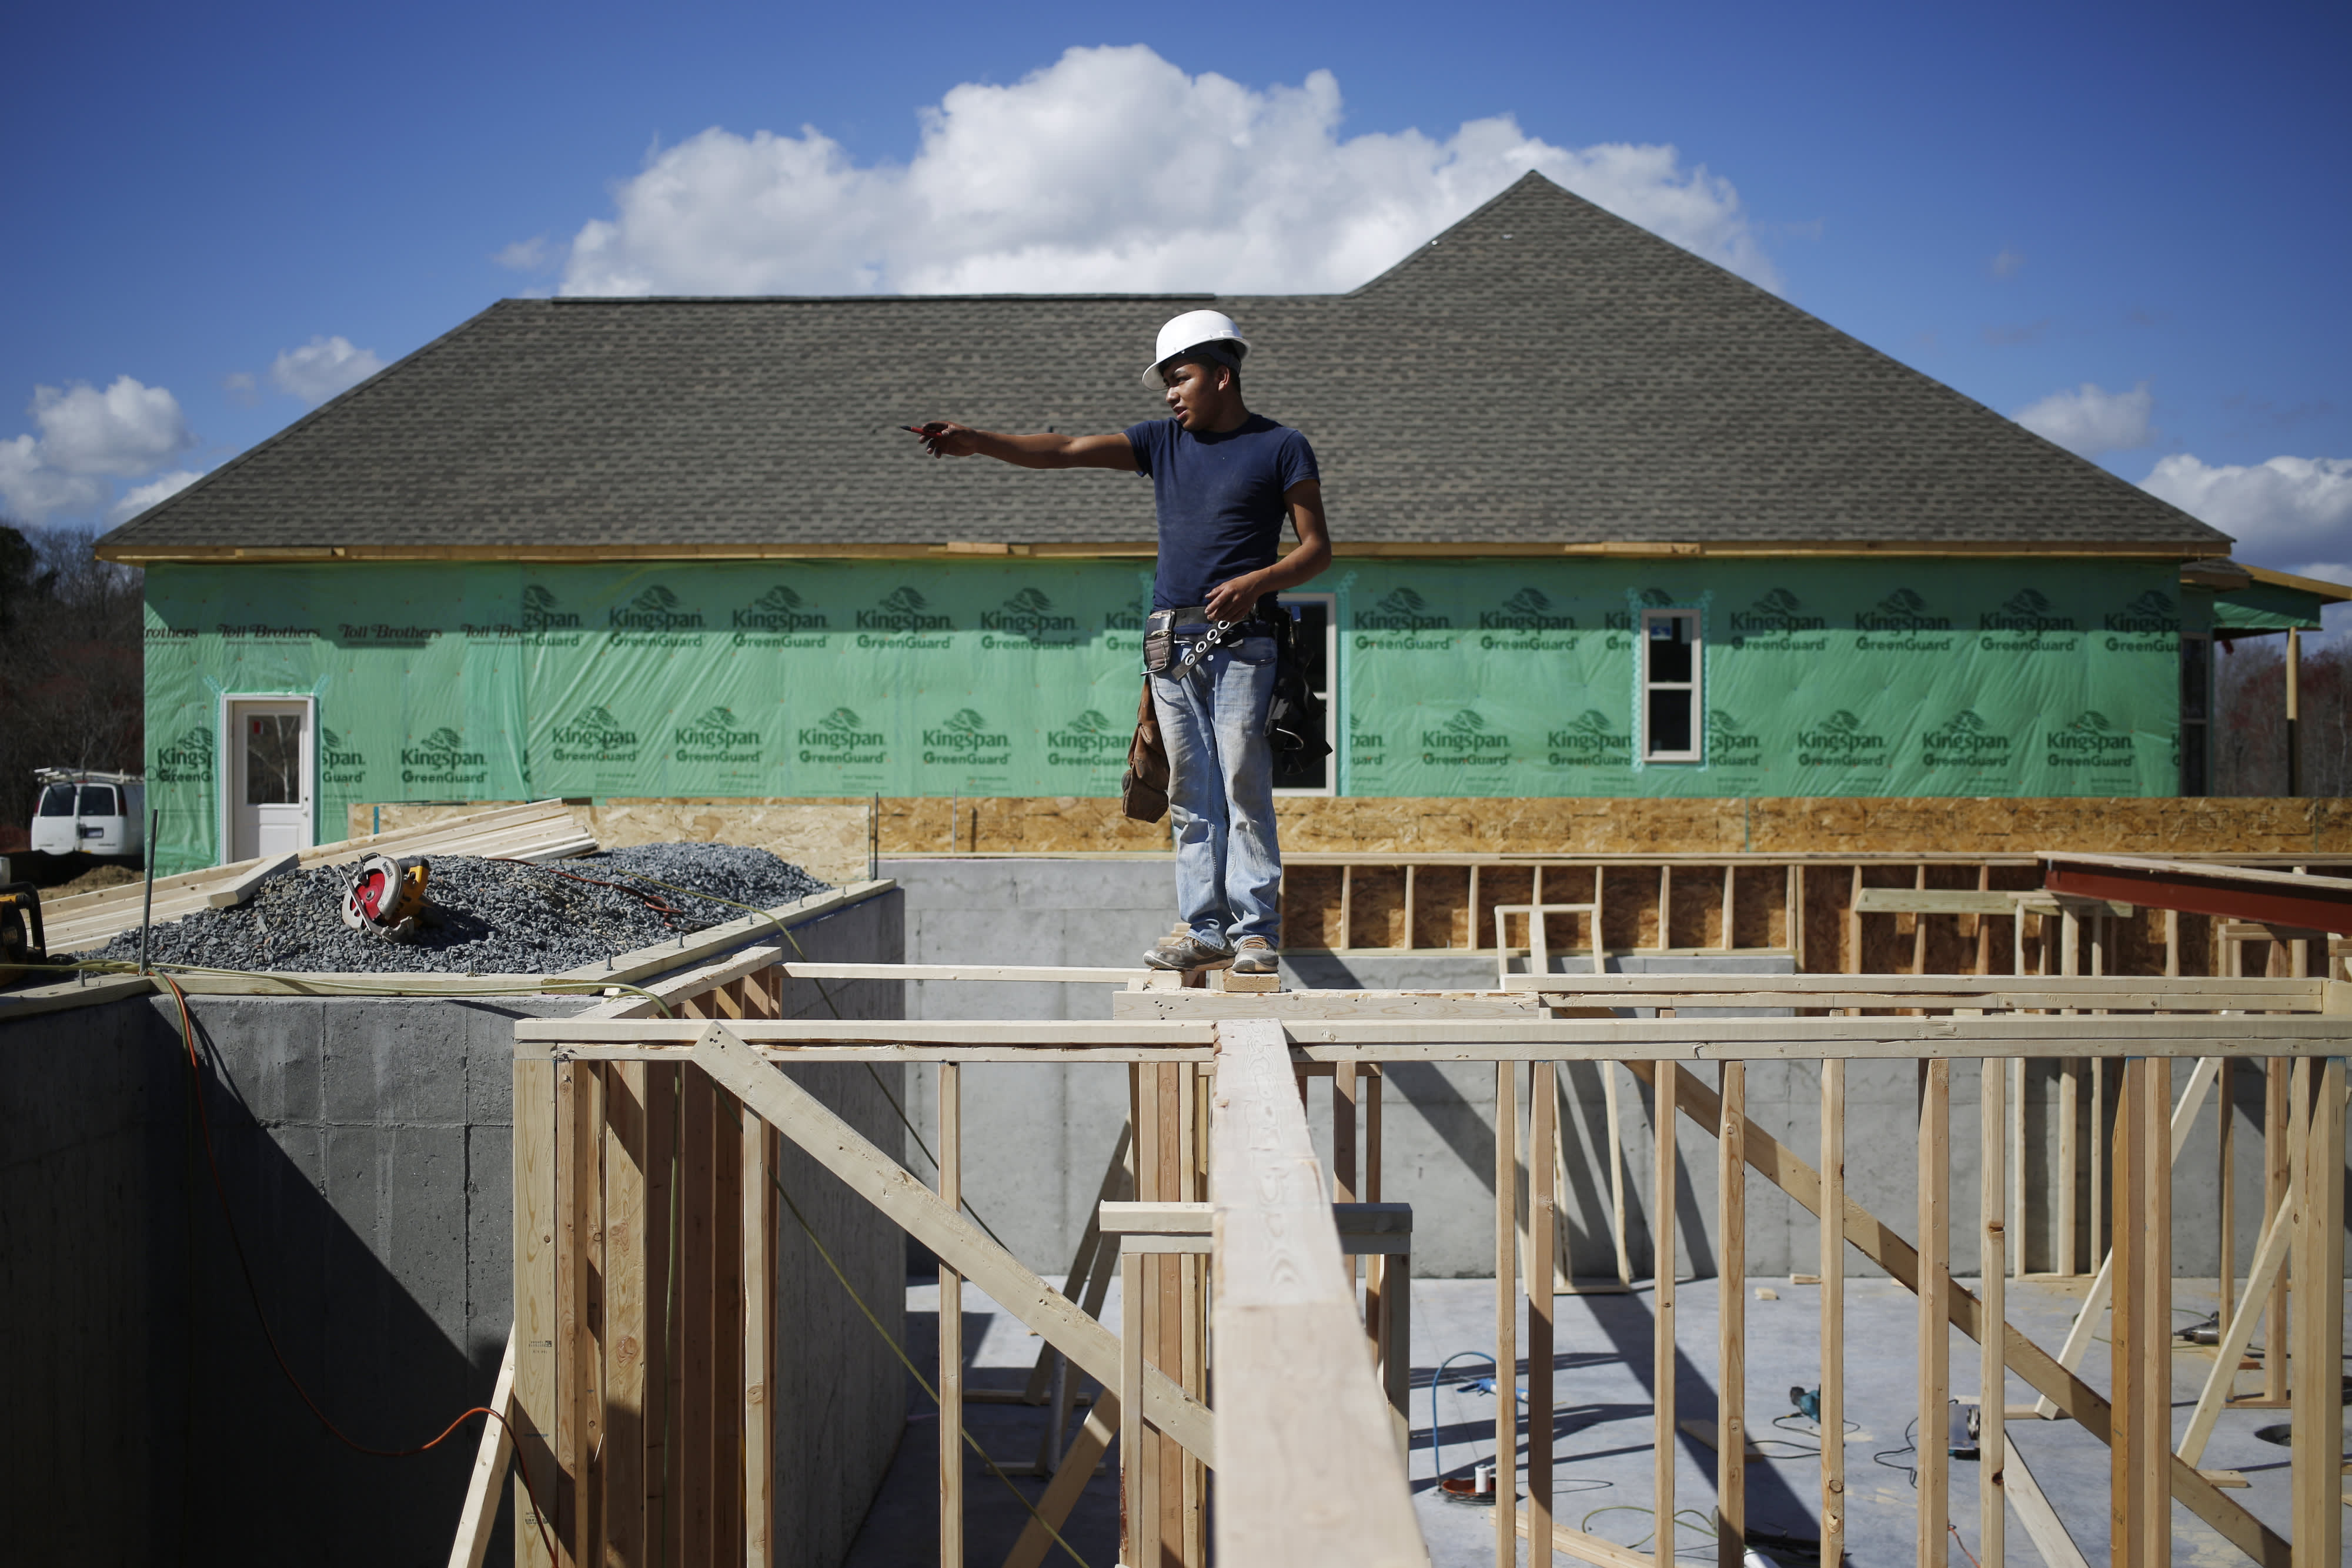 Homebuilder confidence improves, despite record high lumber prices